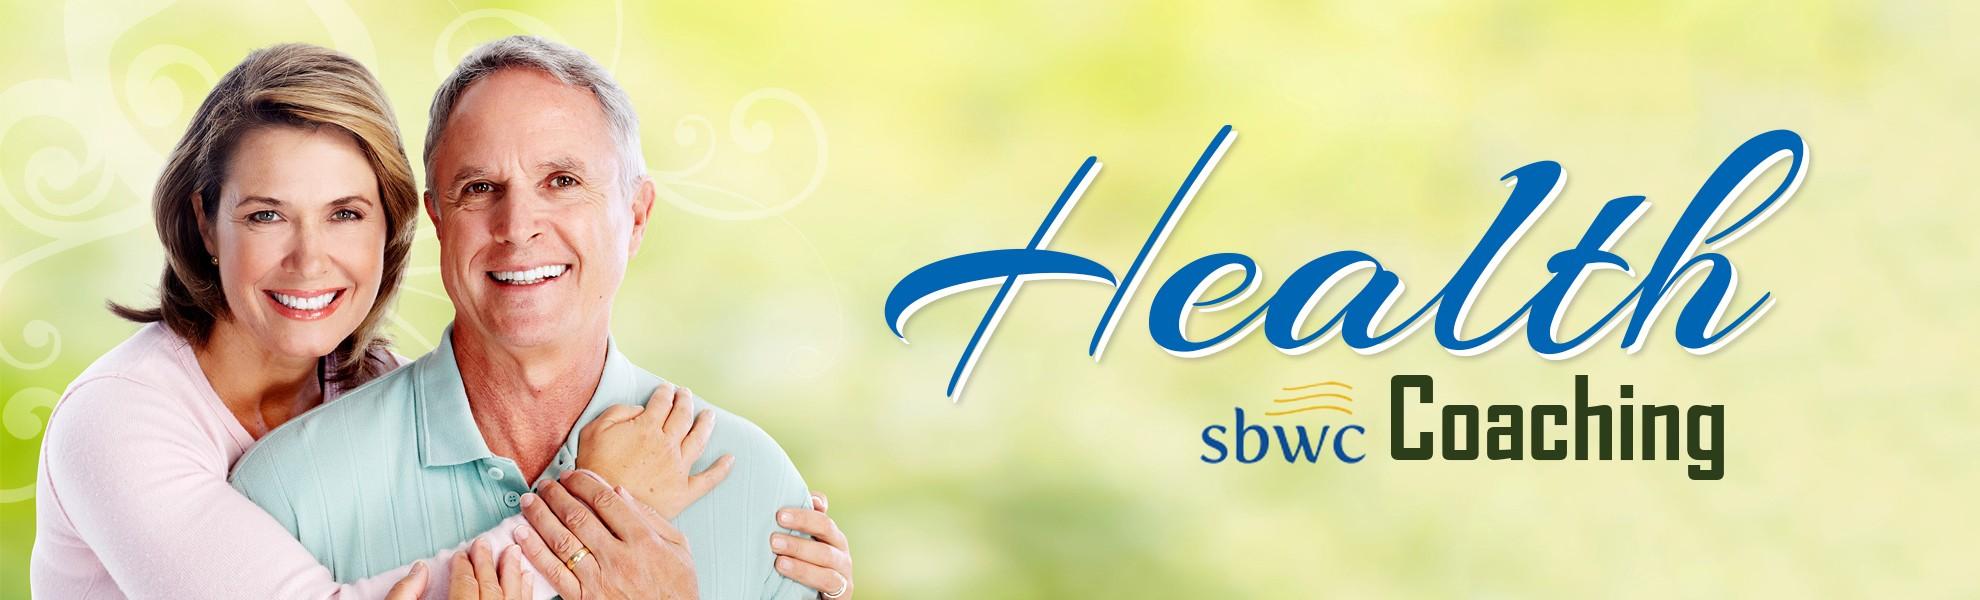 Sbw Coaching Health Coaching - Bem Estar da Famillia